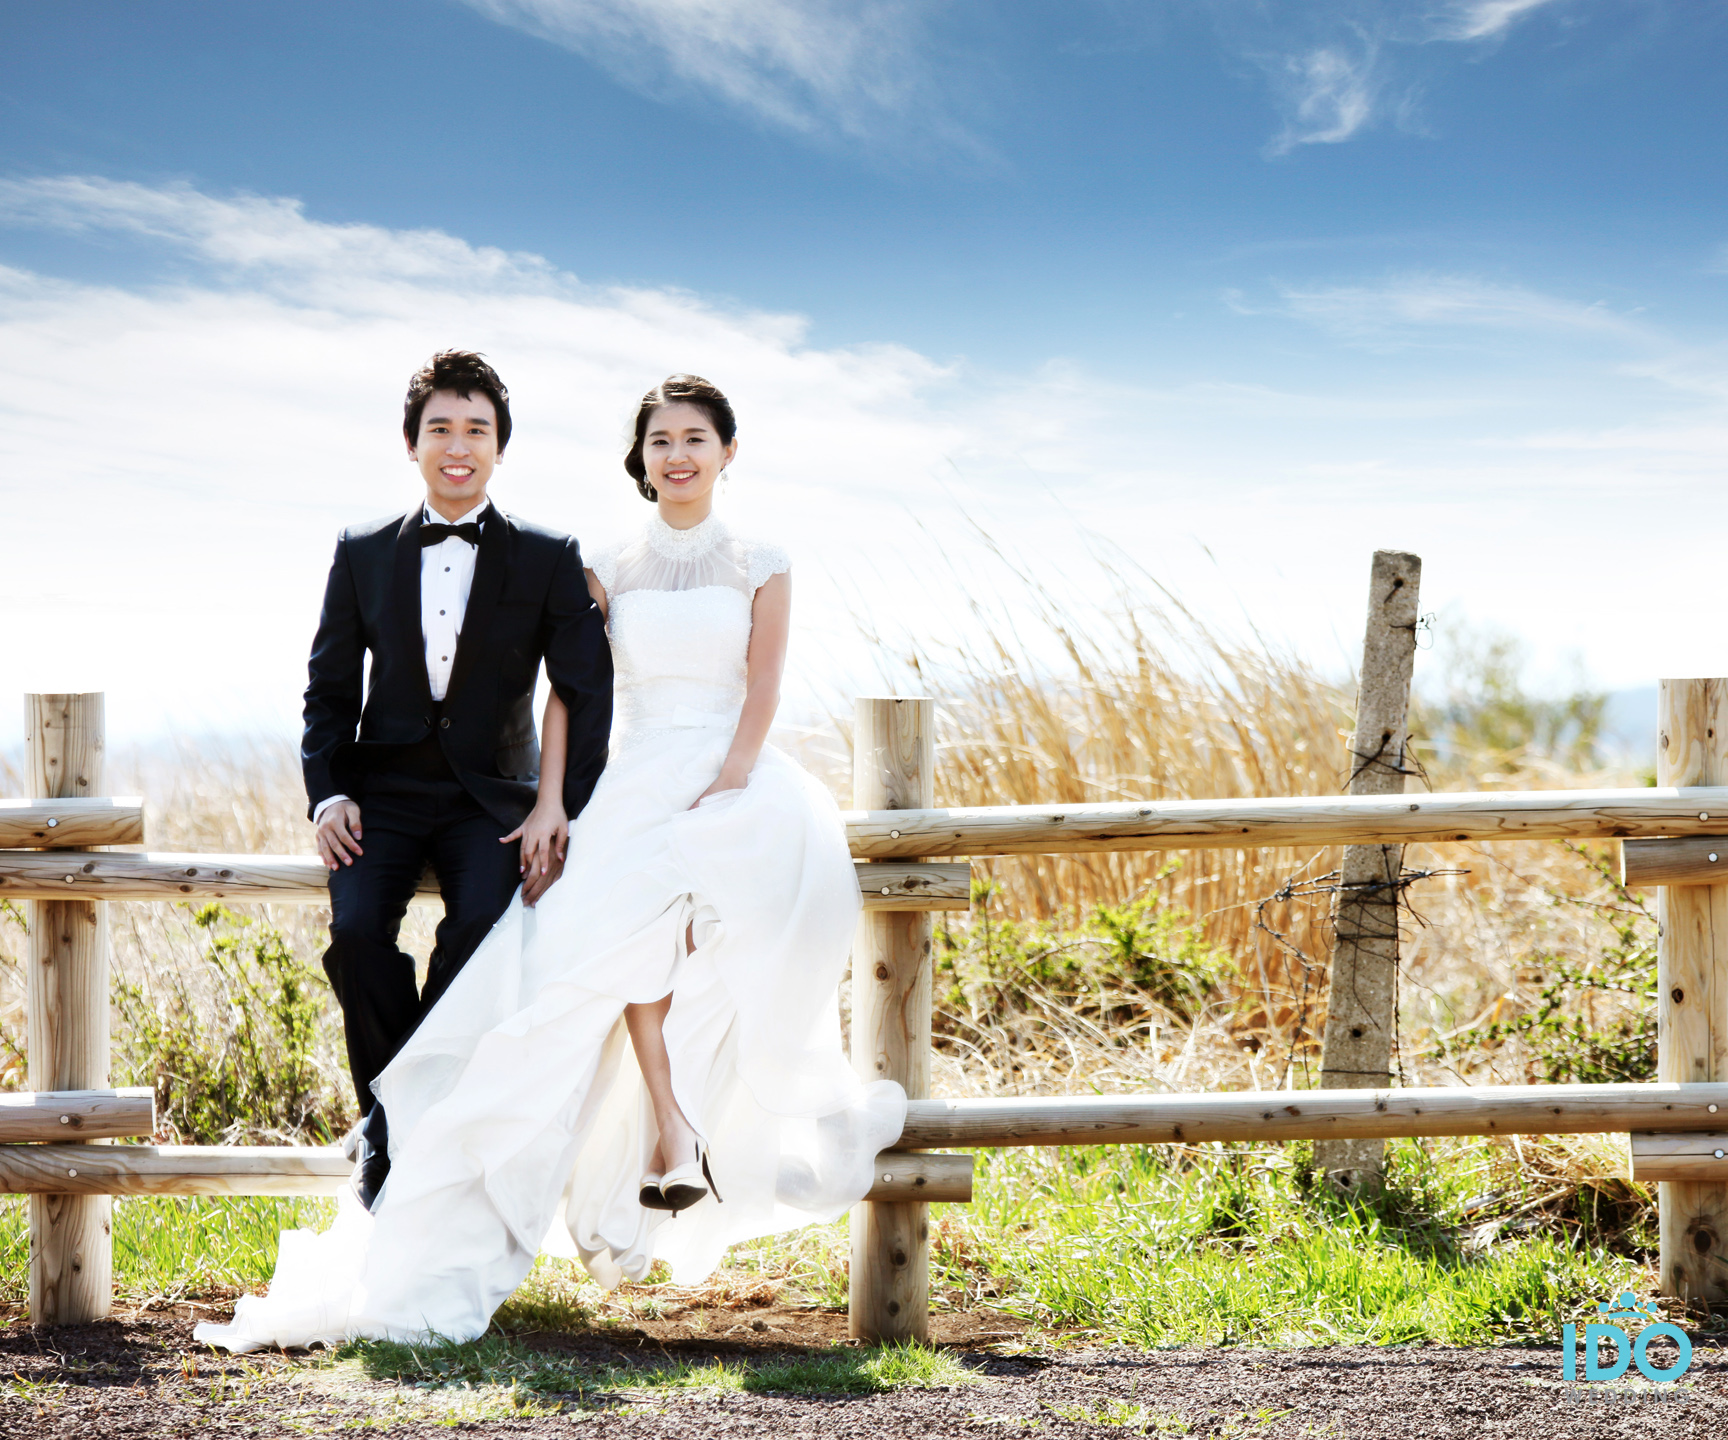 bf638181d00 KOREAN WEDDING PHOTOGRAPHY BY IDOWEDDING